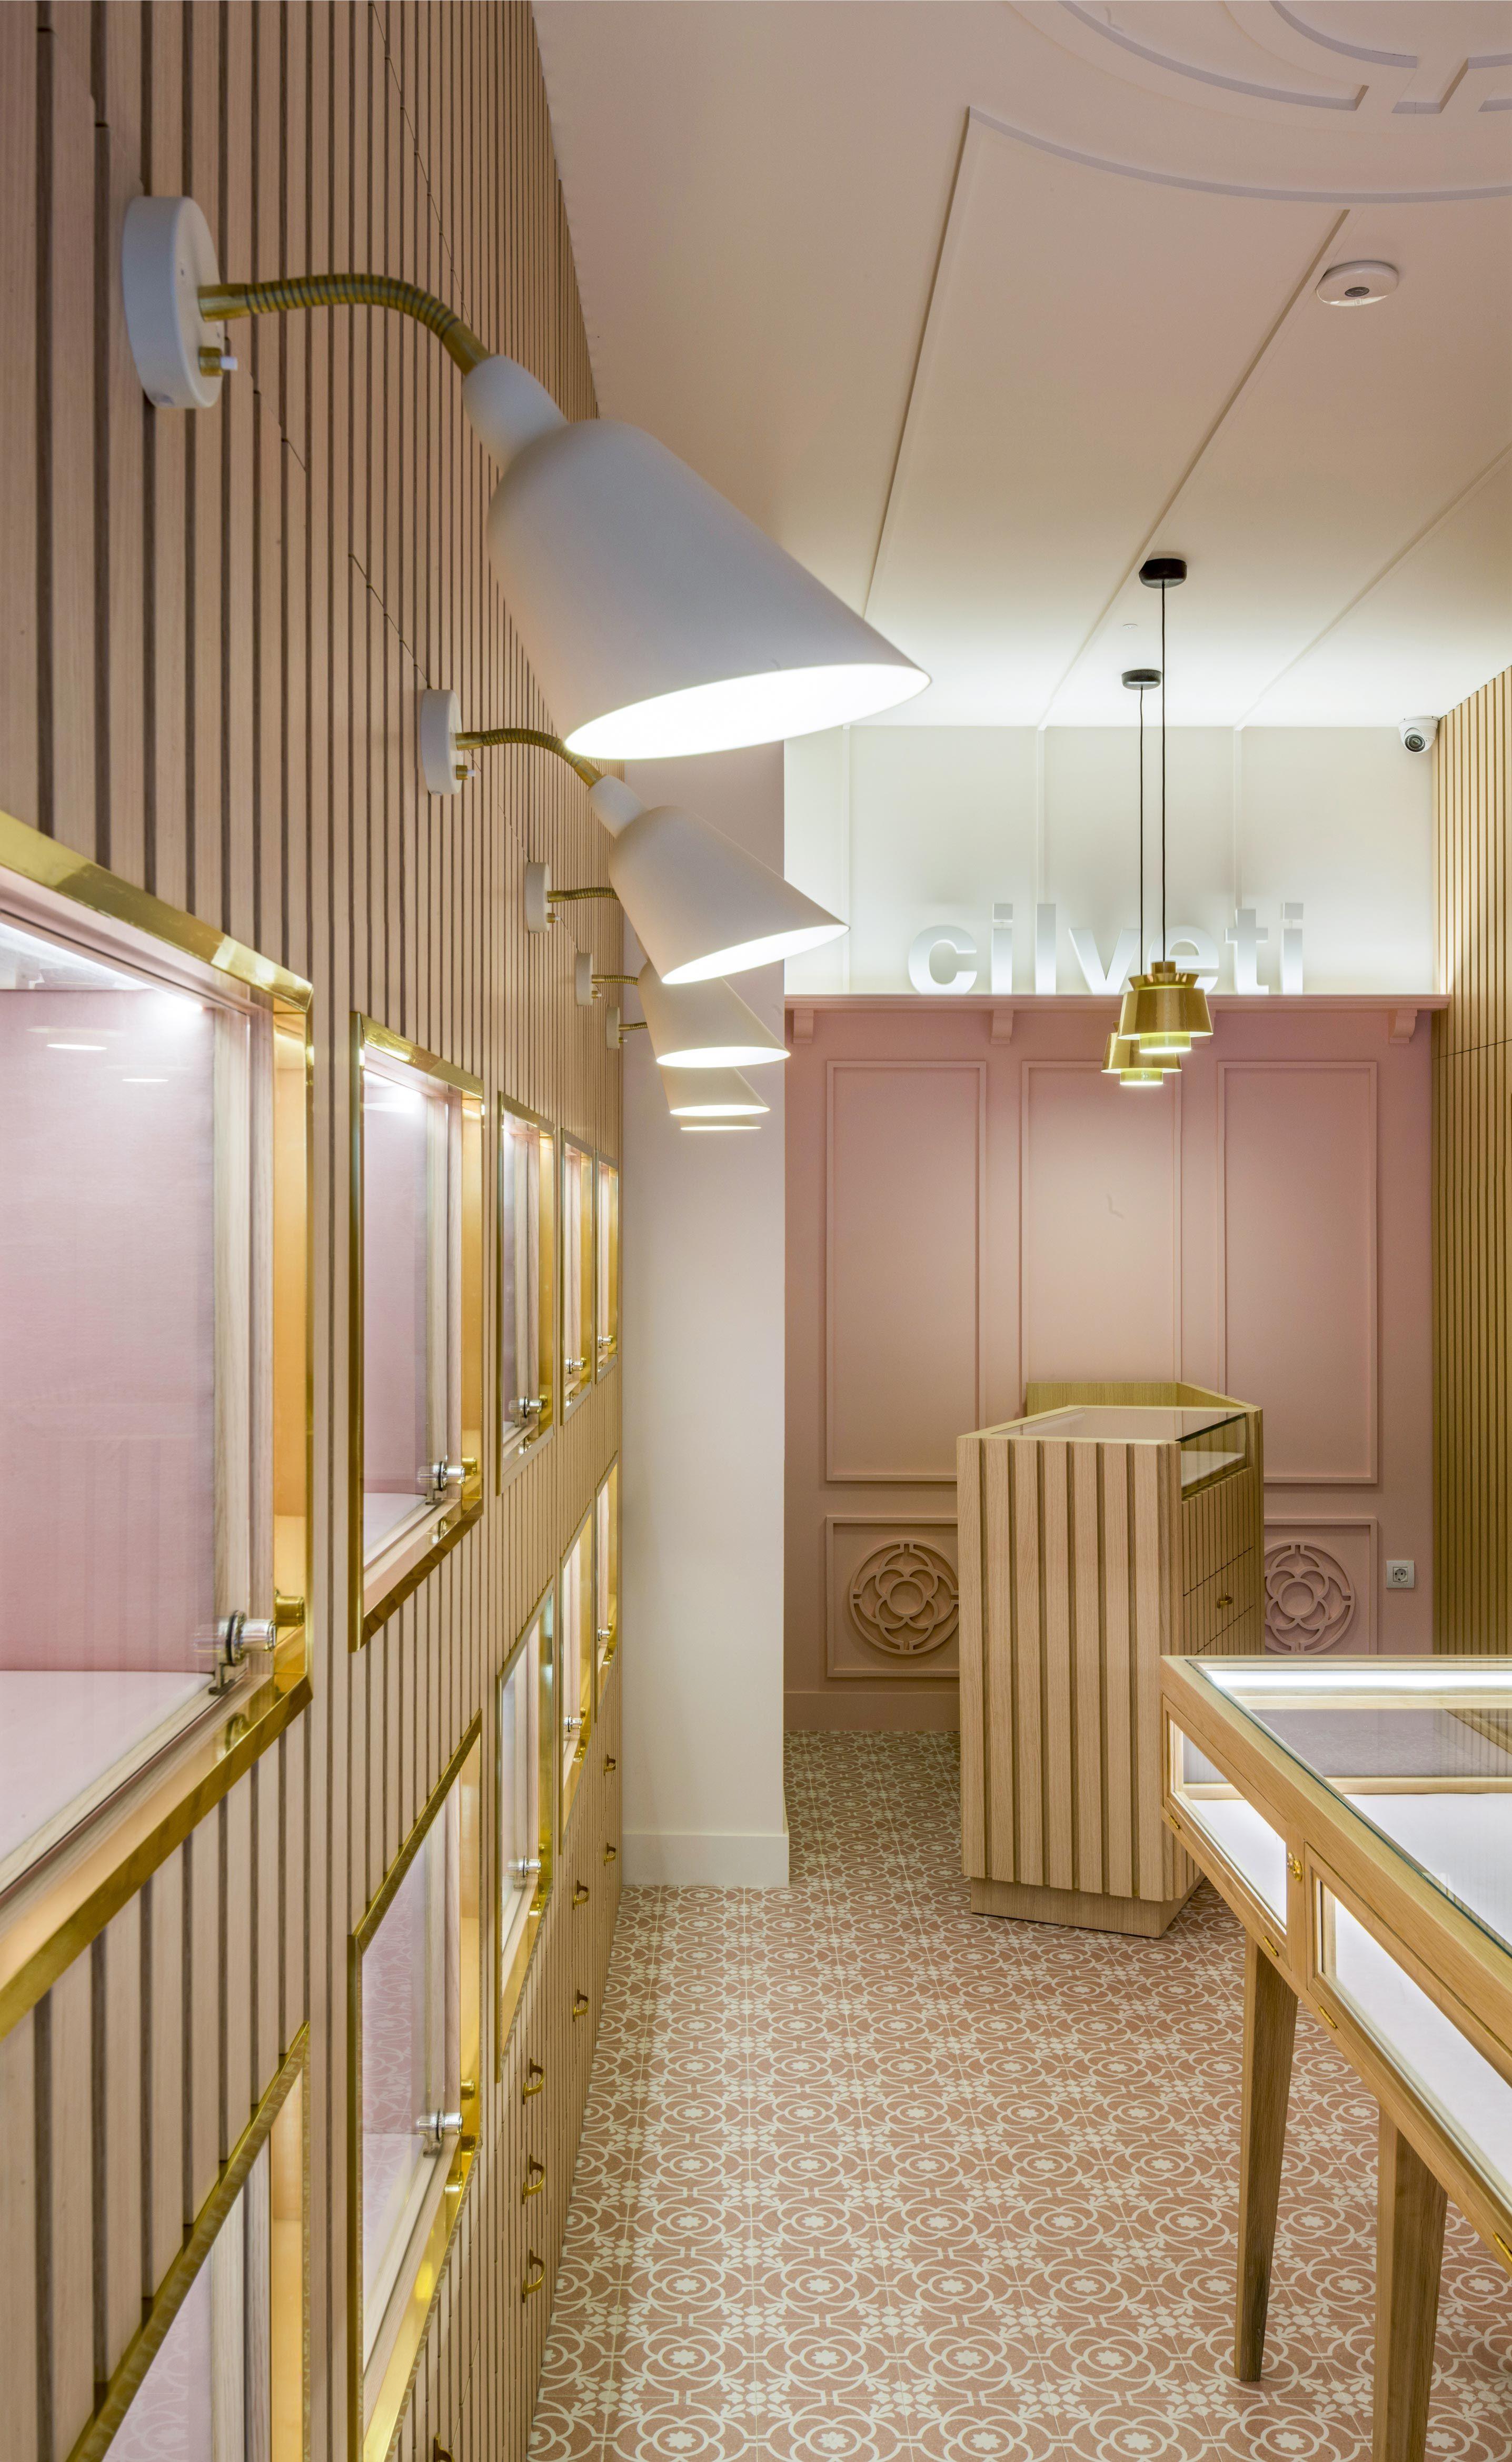 ed1da9edc3f9 Interiorismo comercial tienda bisutería Cilveti en Bilbao por Sube  Interiorismo